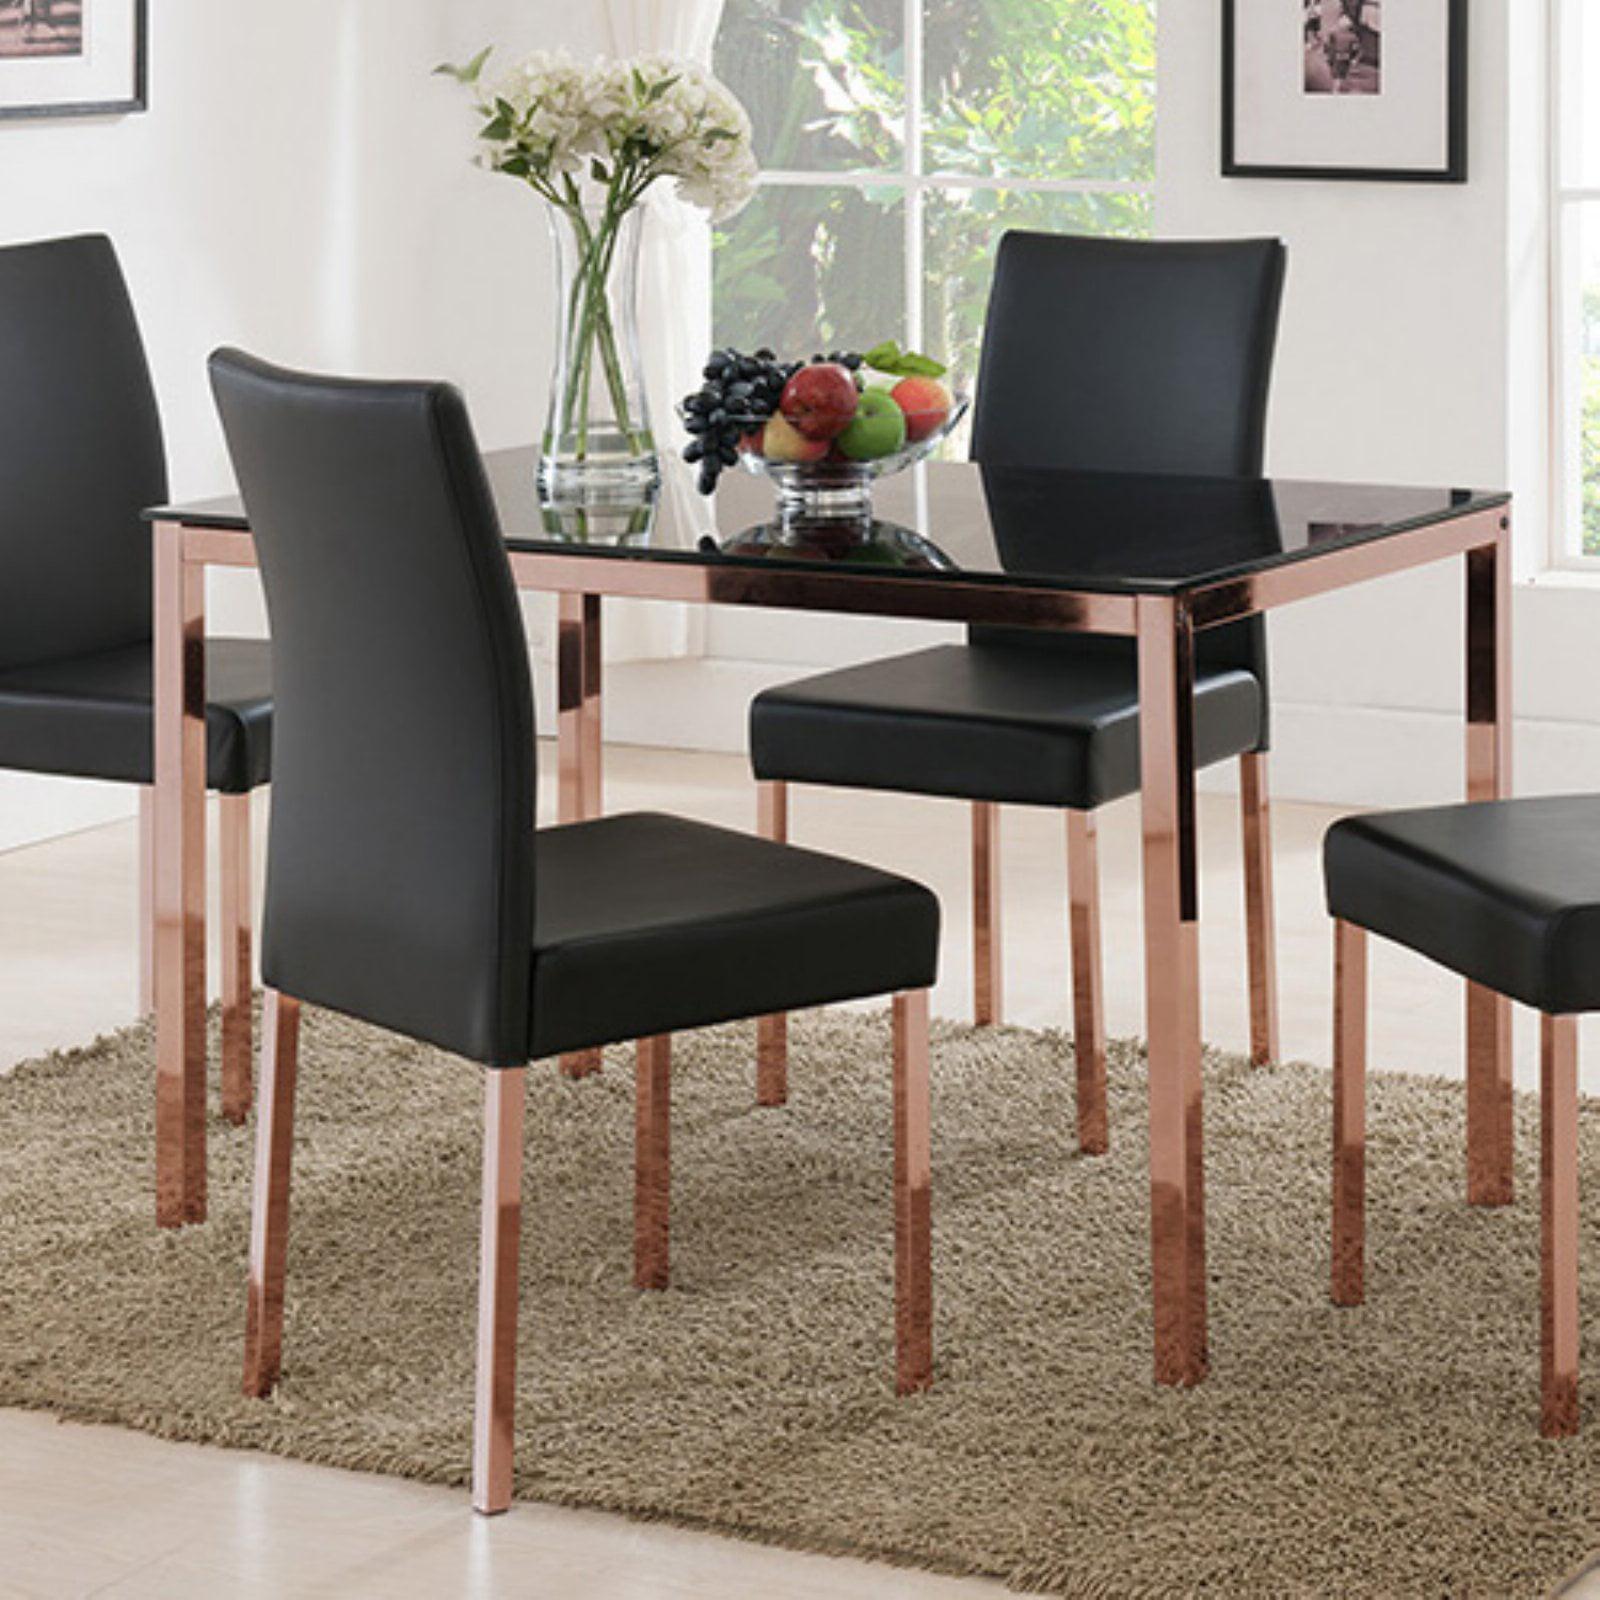 K&B Furniture D919-05 Rose Copper/Black Glass Top Dining Table